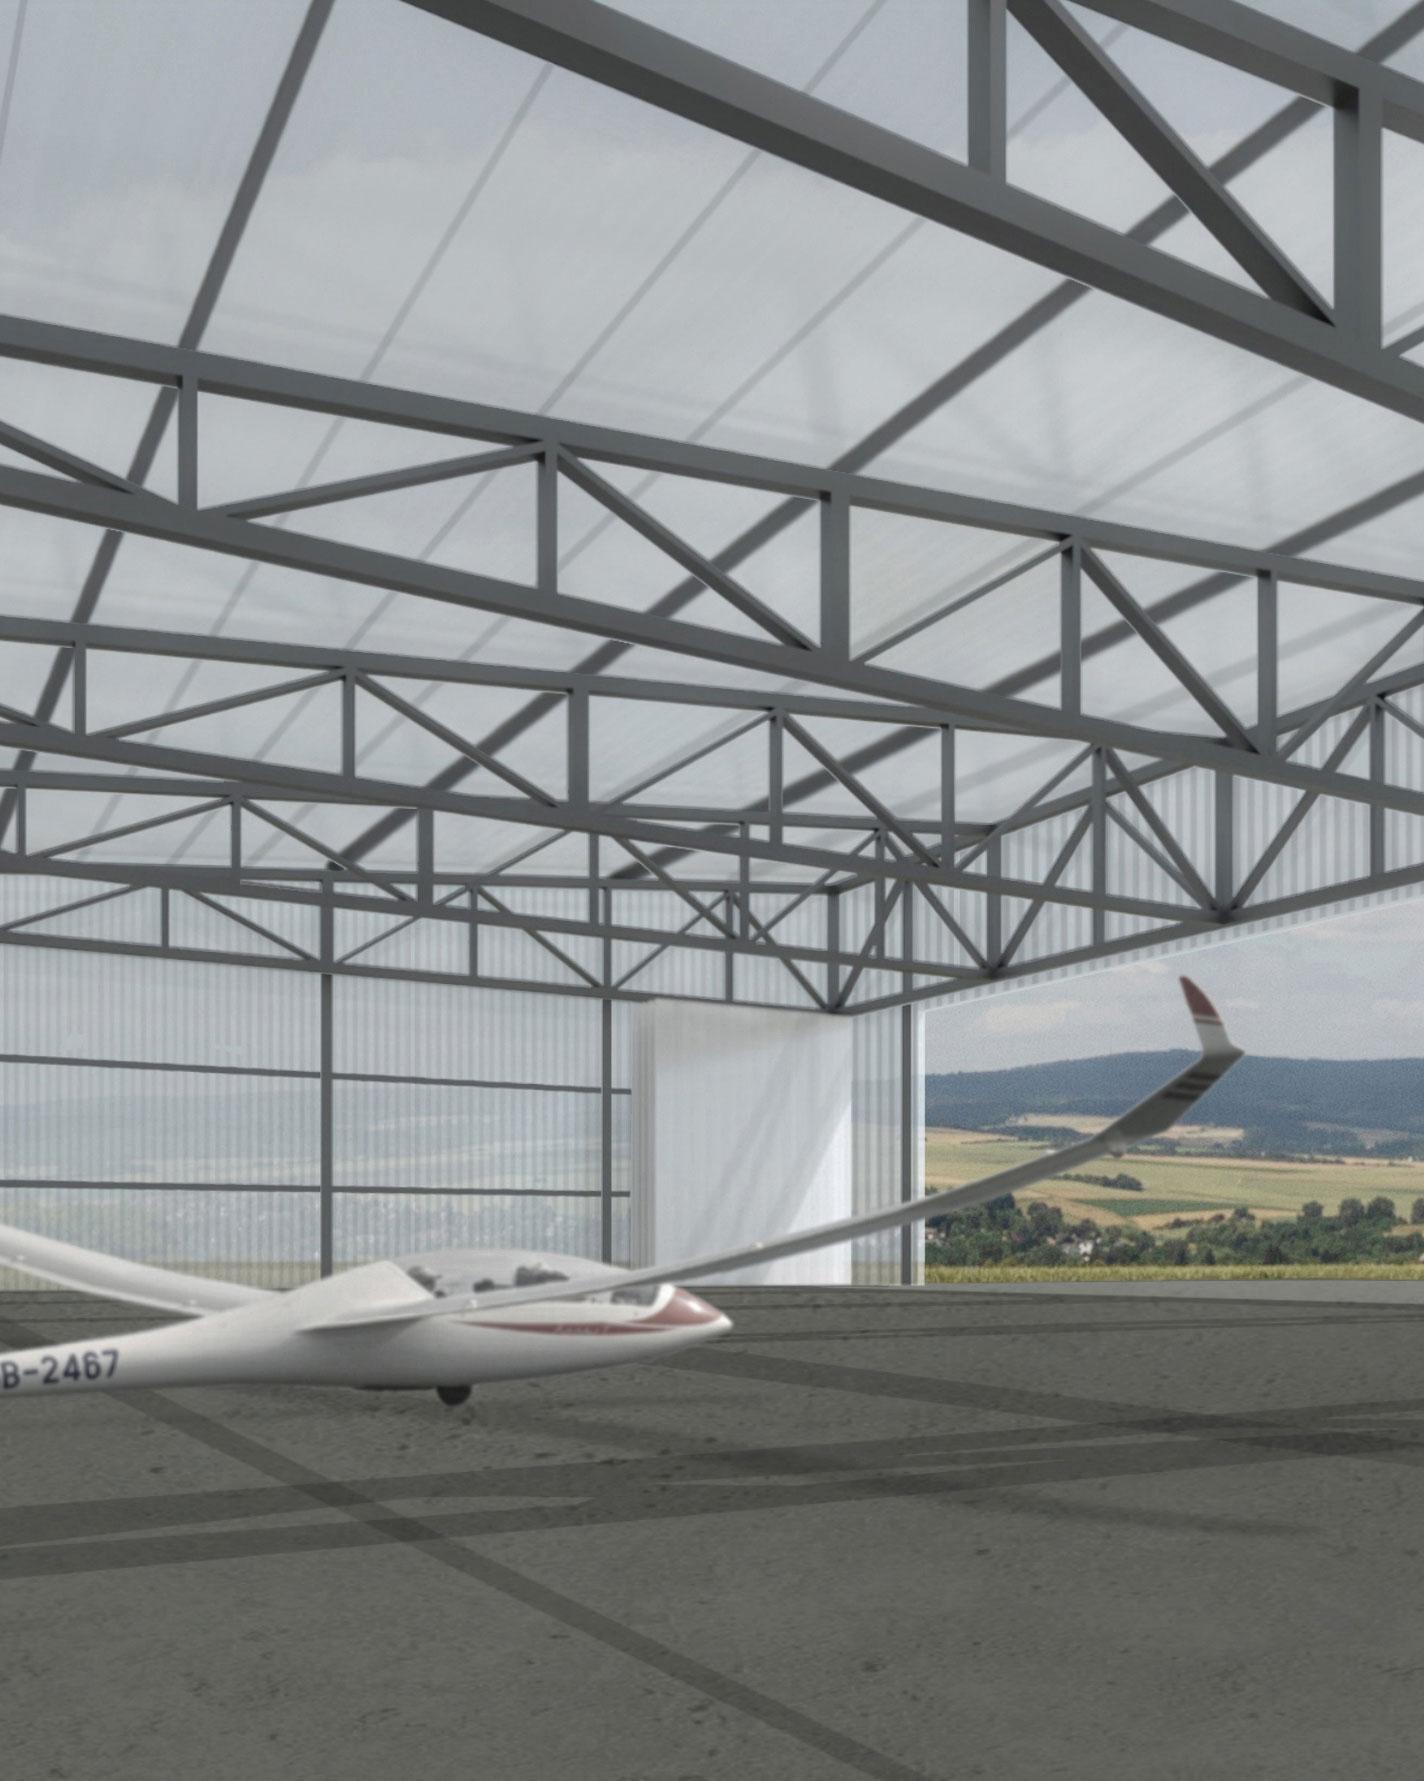 H_05_AeroClub-Render-Poly-Innen2_400_500_NEU-2